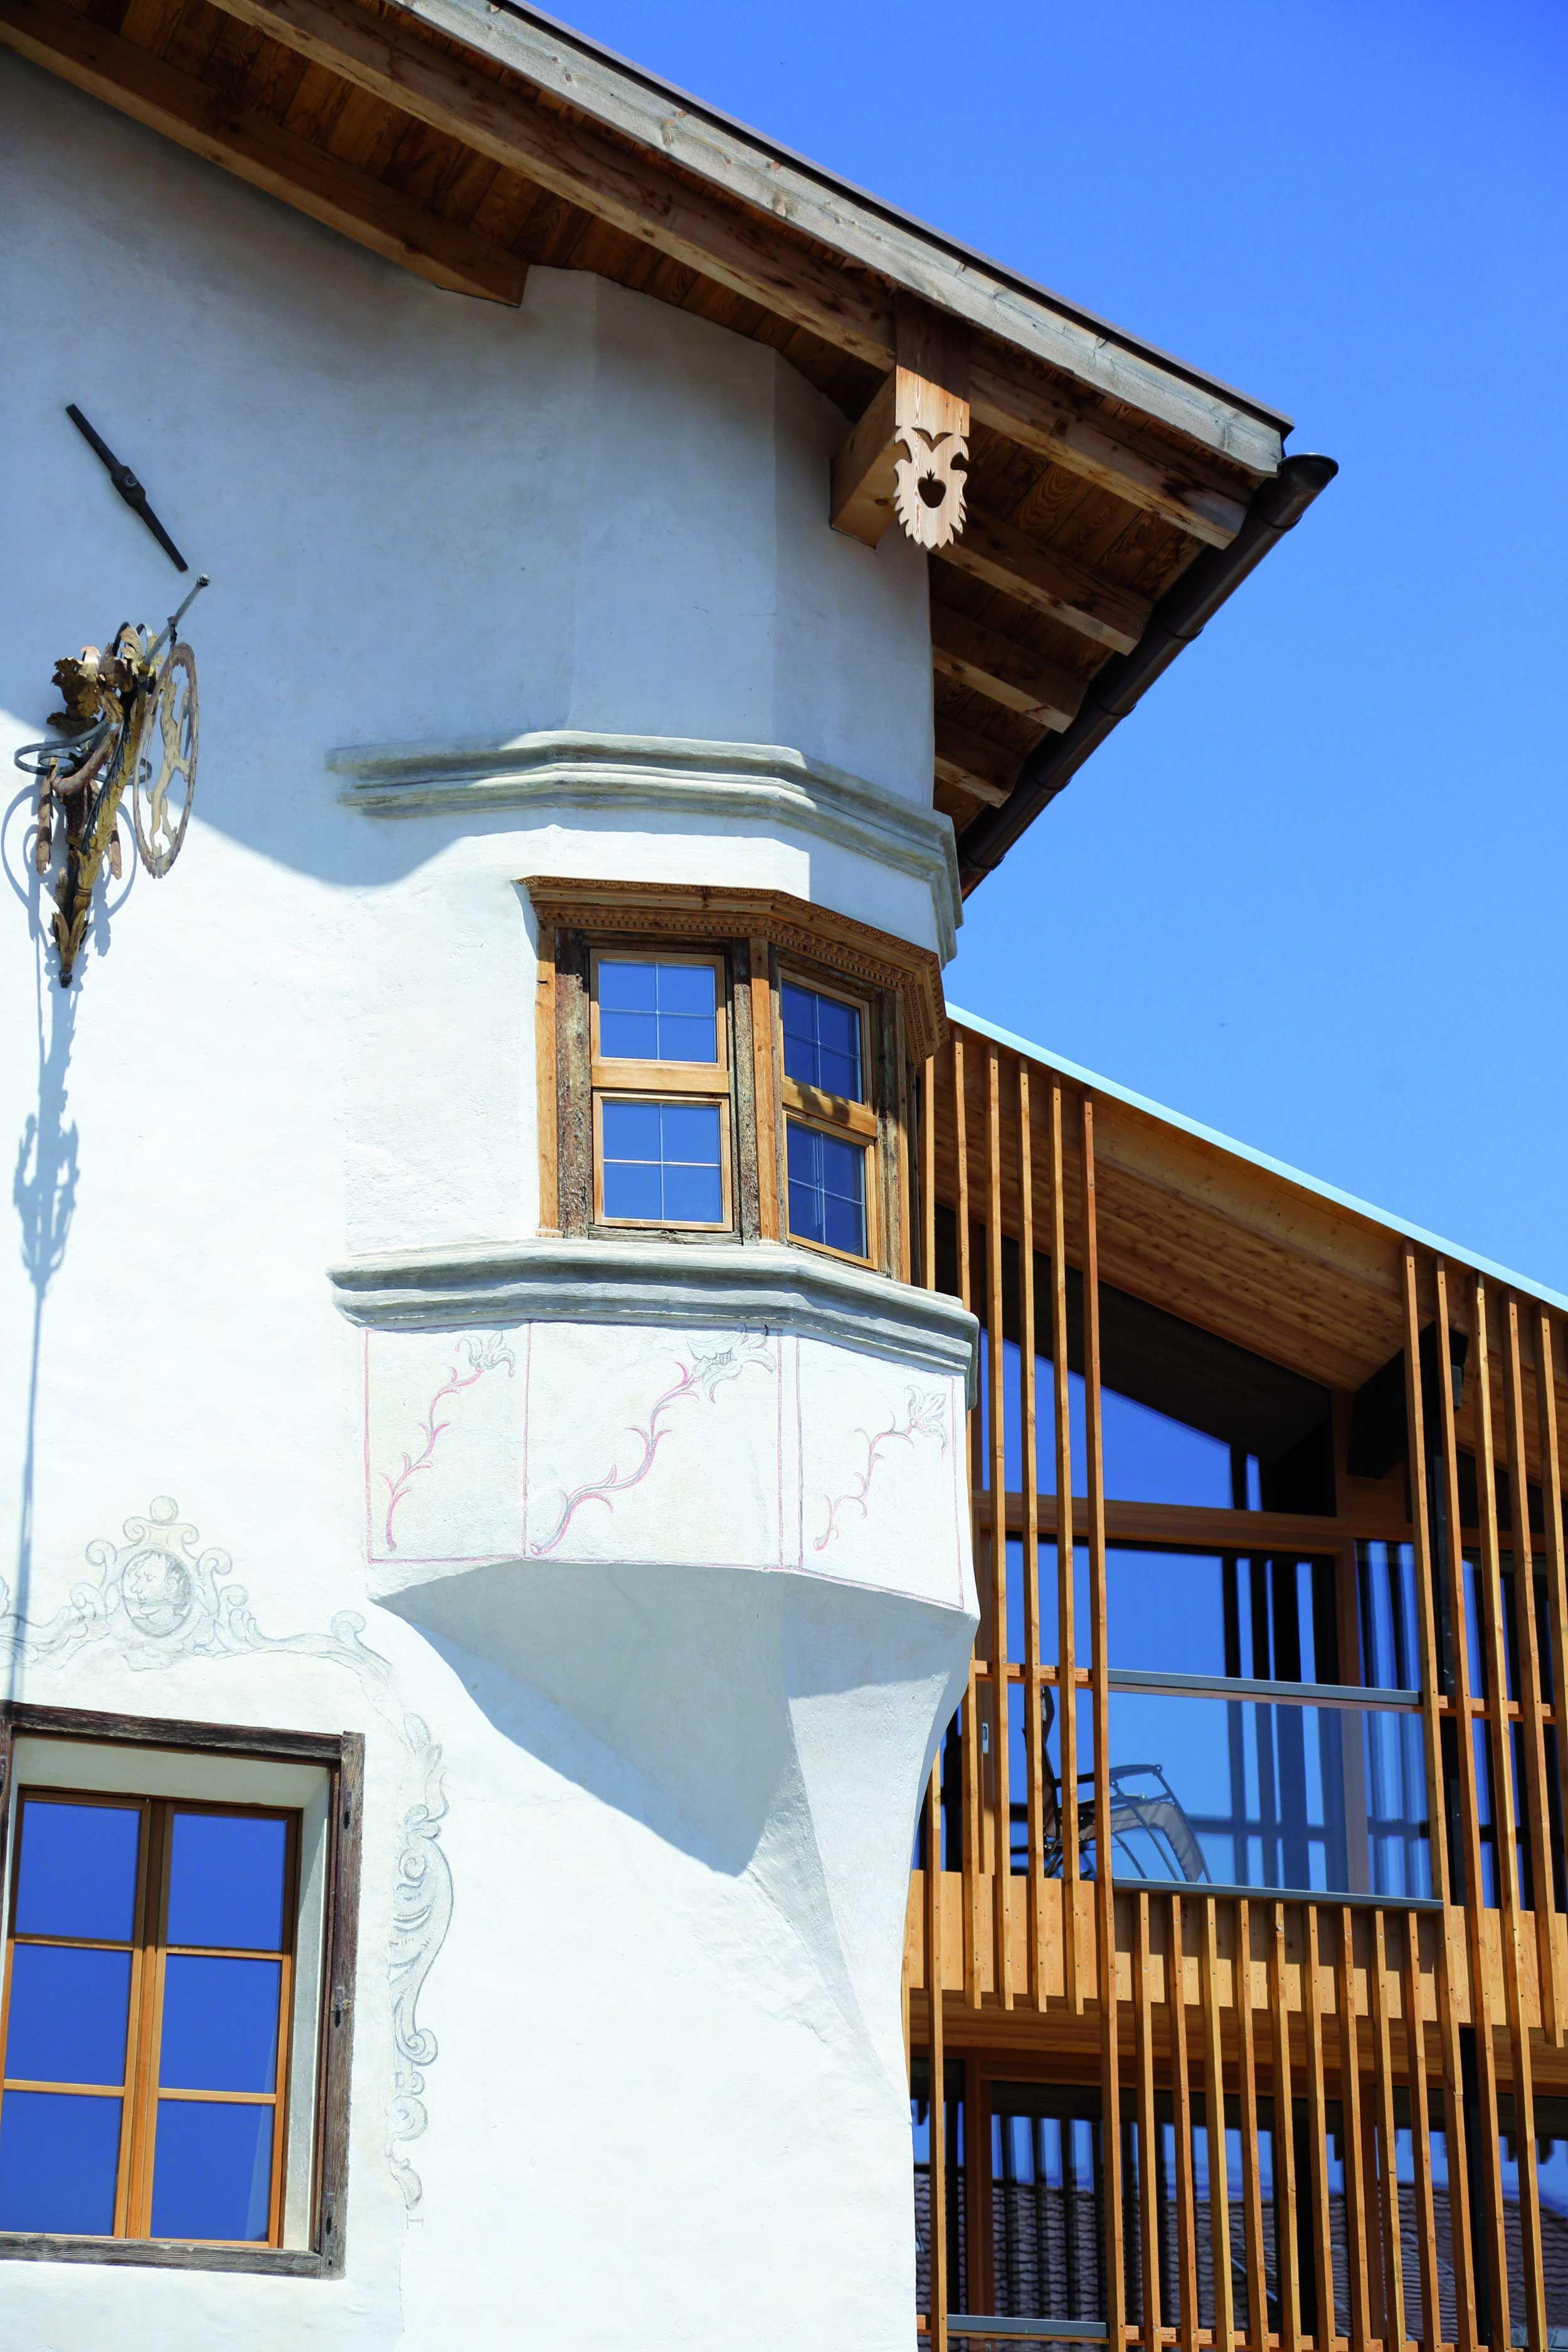 Romantik Hotel Weisses Kreuz | Design Hotel | Italy | http://lifestylehotels.net/en/hotel-weisses-kreuz | Exterior View | Alpine Design